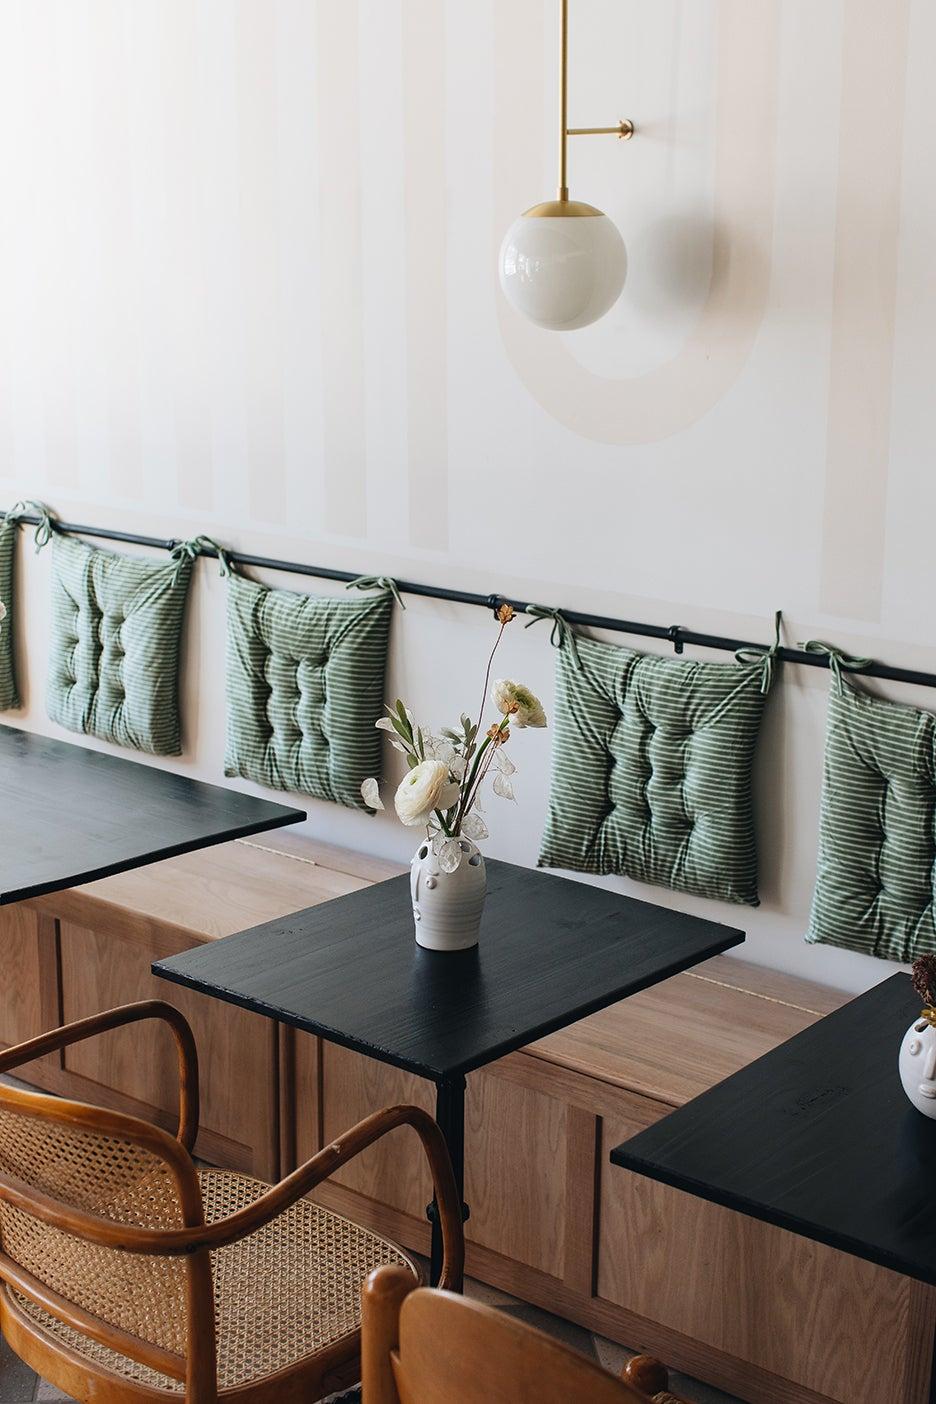 seat cushions in a restaurant